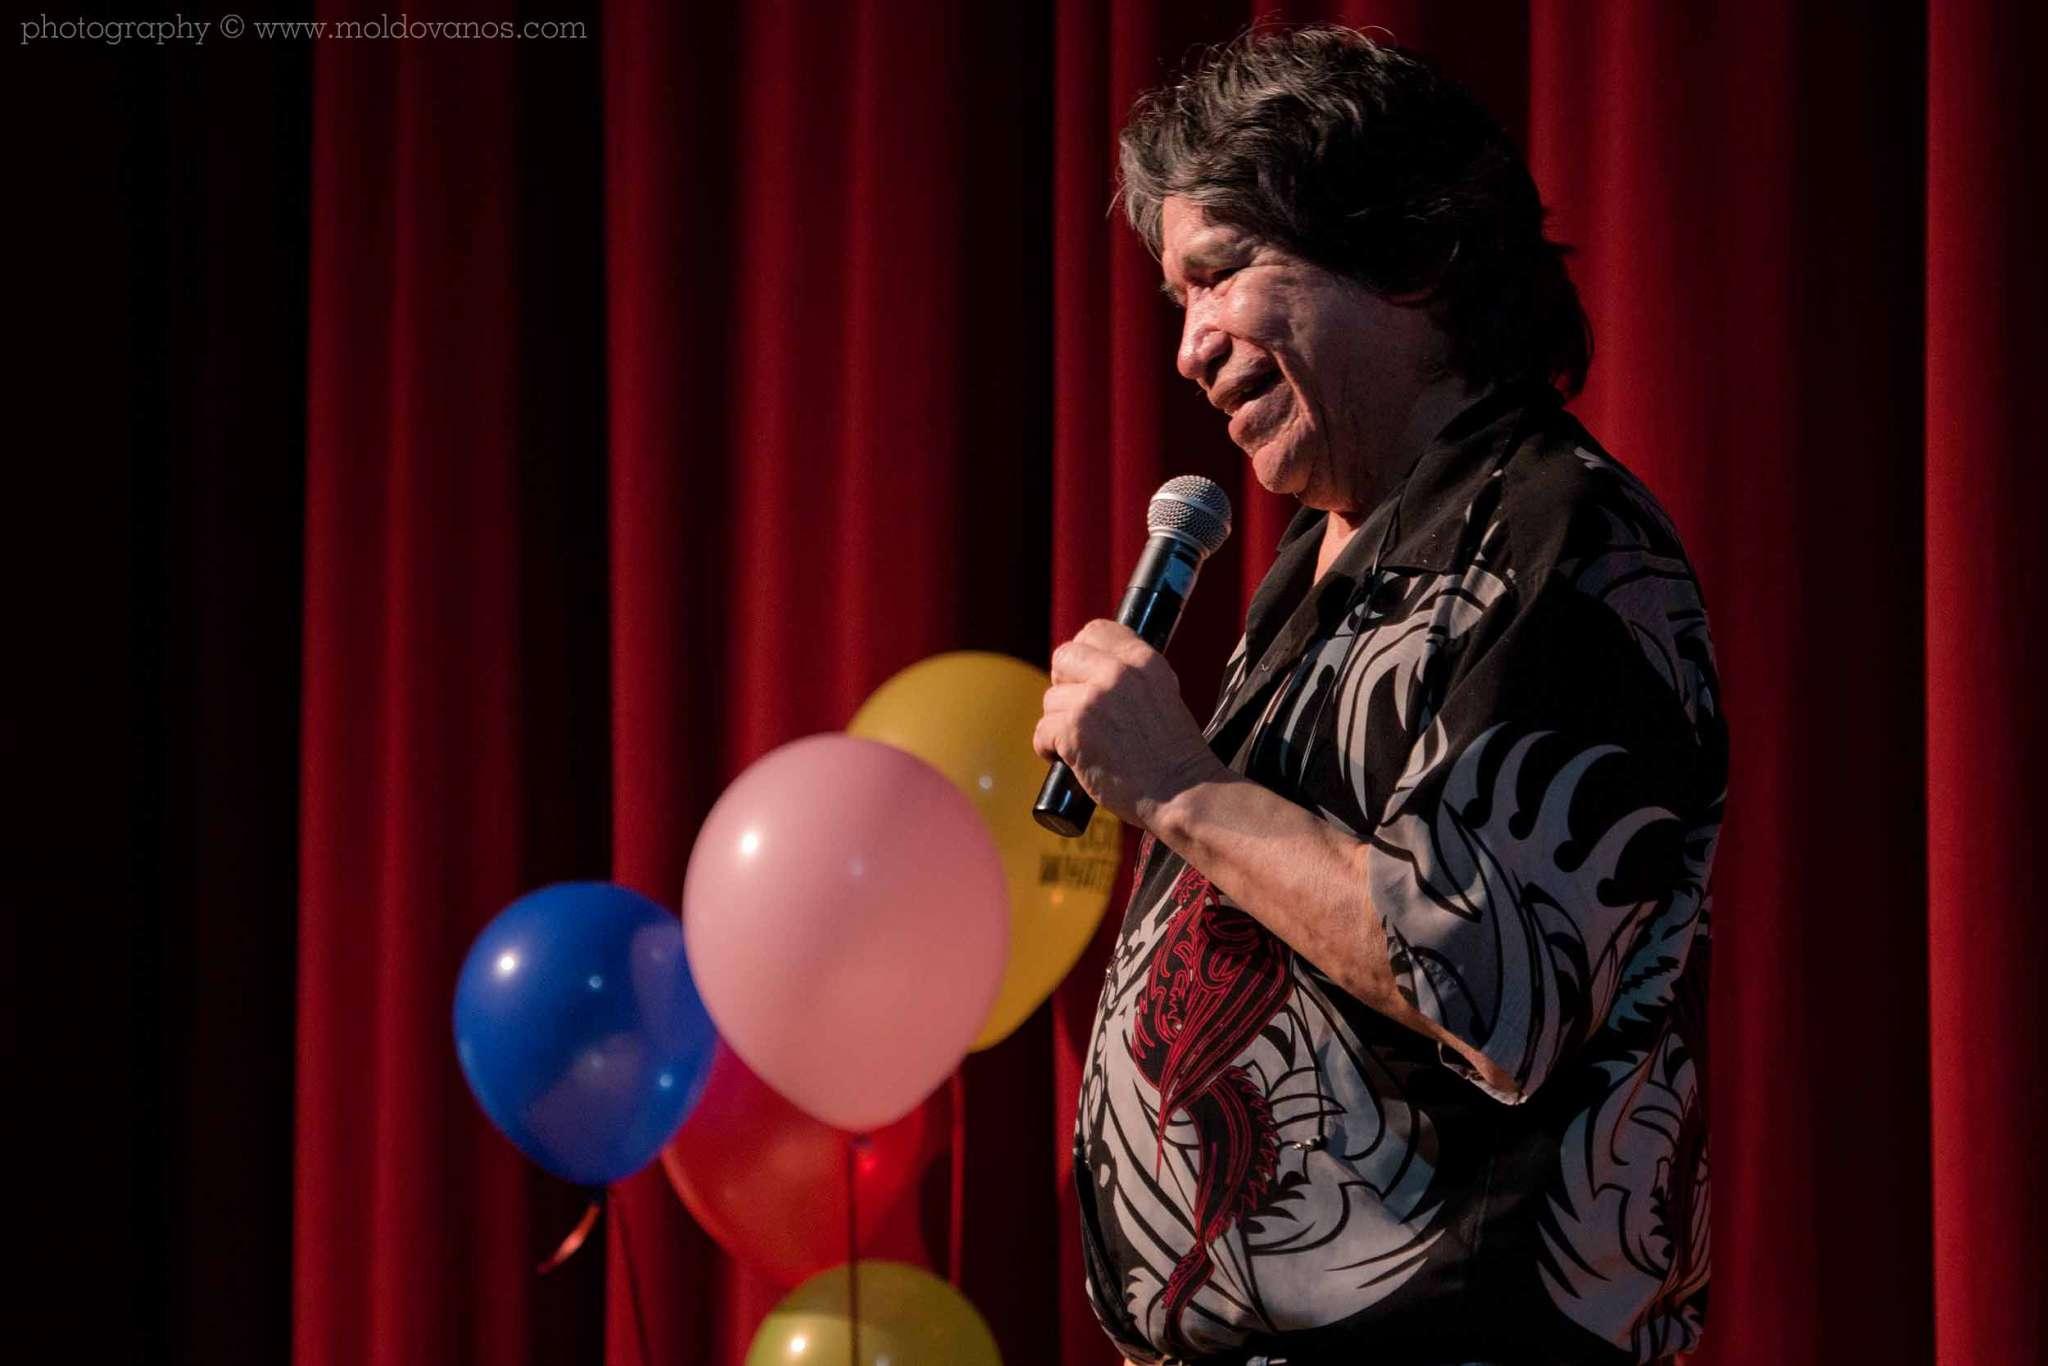 Bubbas Comedy First Nations- Event Photography by Paul Moldovanos © moldovanos.com